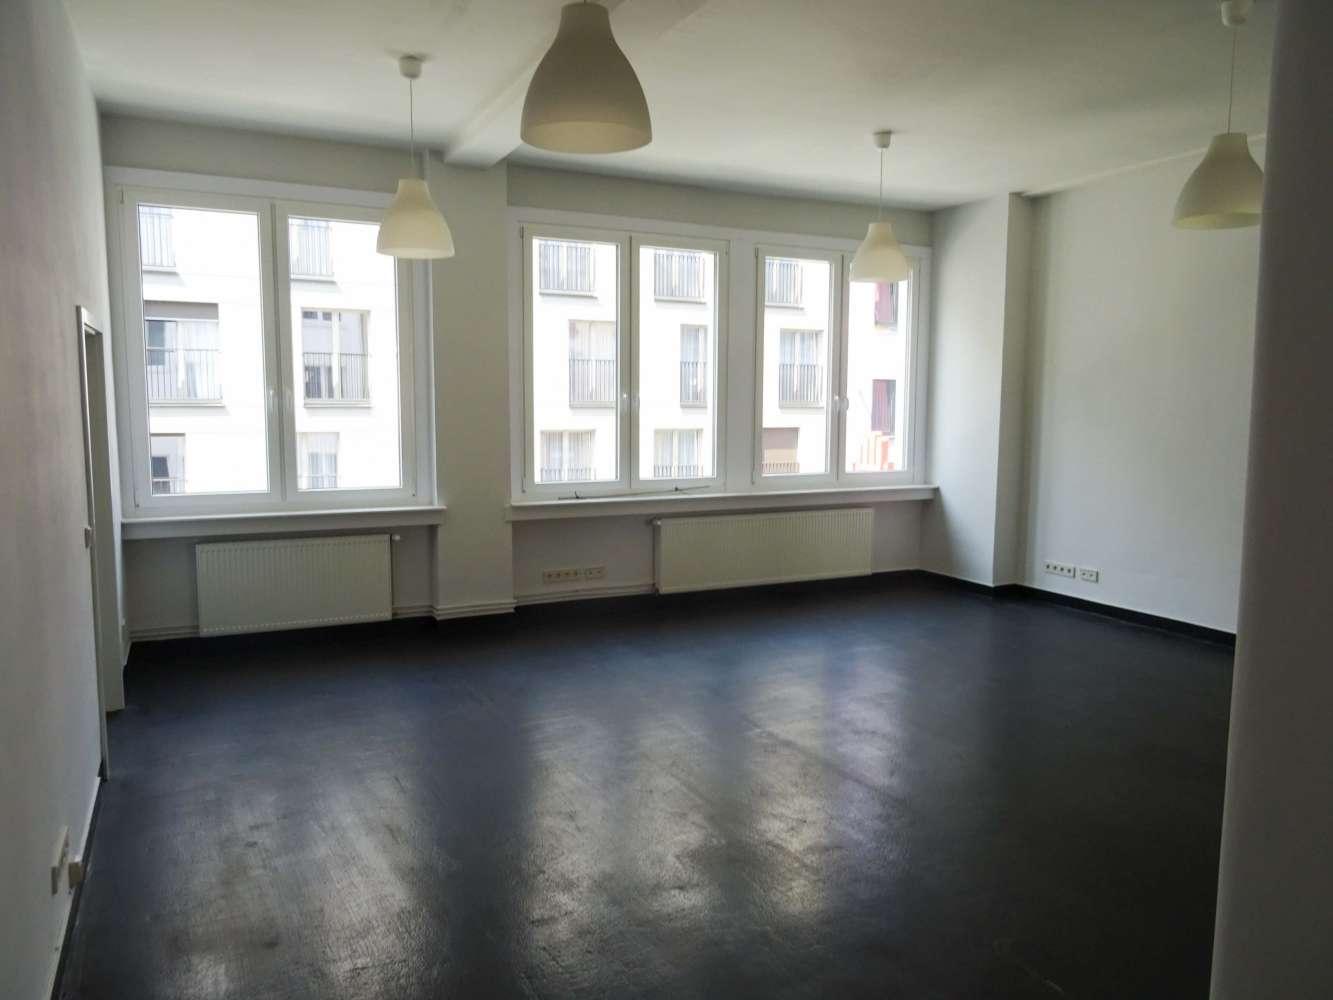 Büros Frankfurt am main, 60329 - Büro - Frankfurt am Main, Bahnhofsviertel - F2646 - 10375254